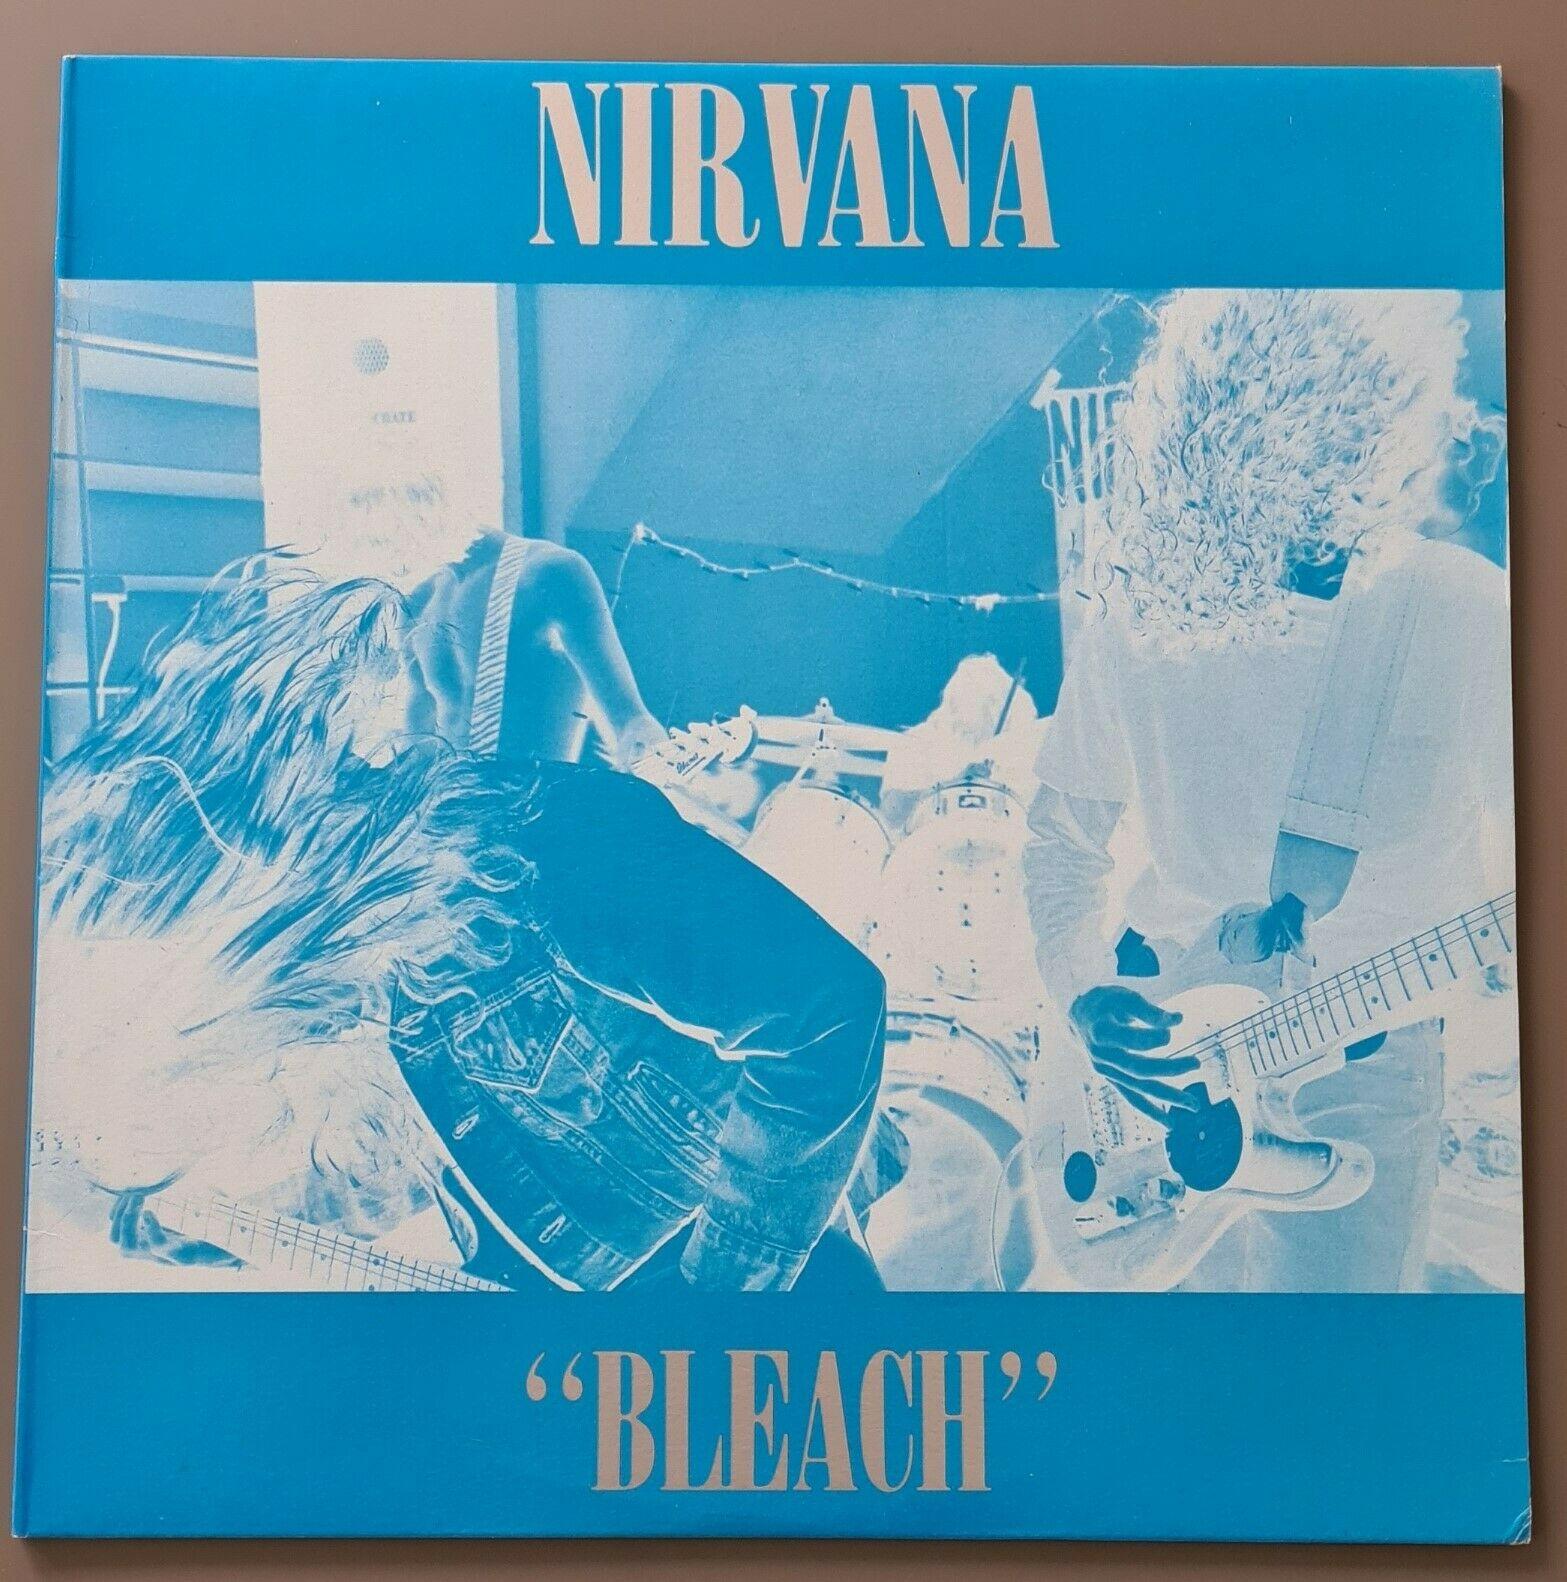 Nirvana   Bleach  Waterfront Records     DAMP 114  Blue Vinyl  Blue   Silver Sleev